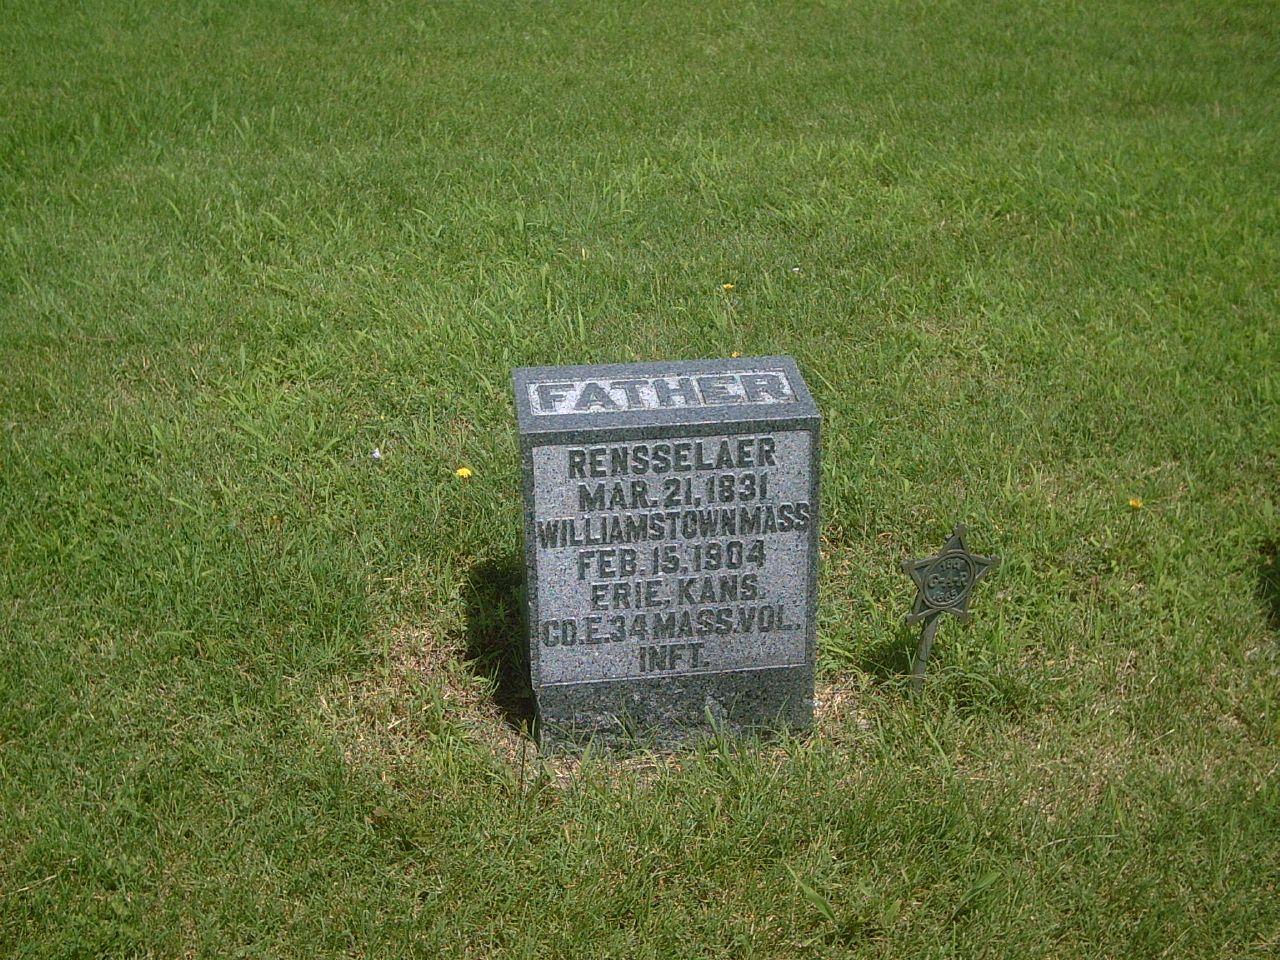 Kansas neosho county stark - Hobby Civilwarveteran Easthillcemetery Tombstonephoto Rensselaerbutler Coe34thmainfantry Bornatwilliamstownmaonmarch211831 Eriekansas